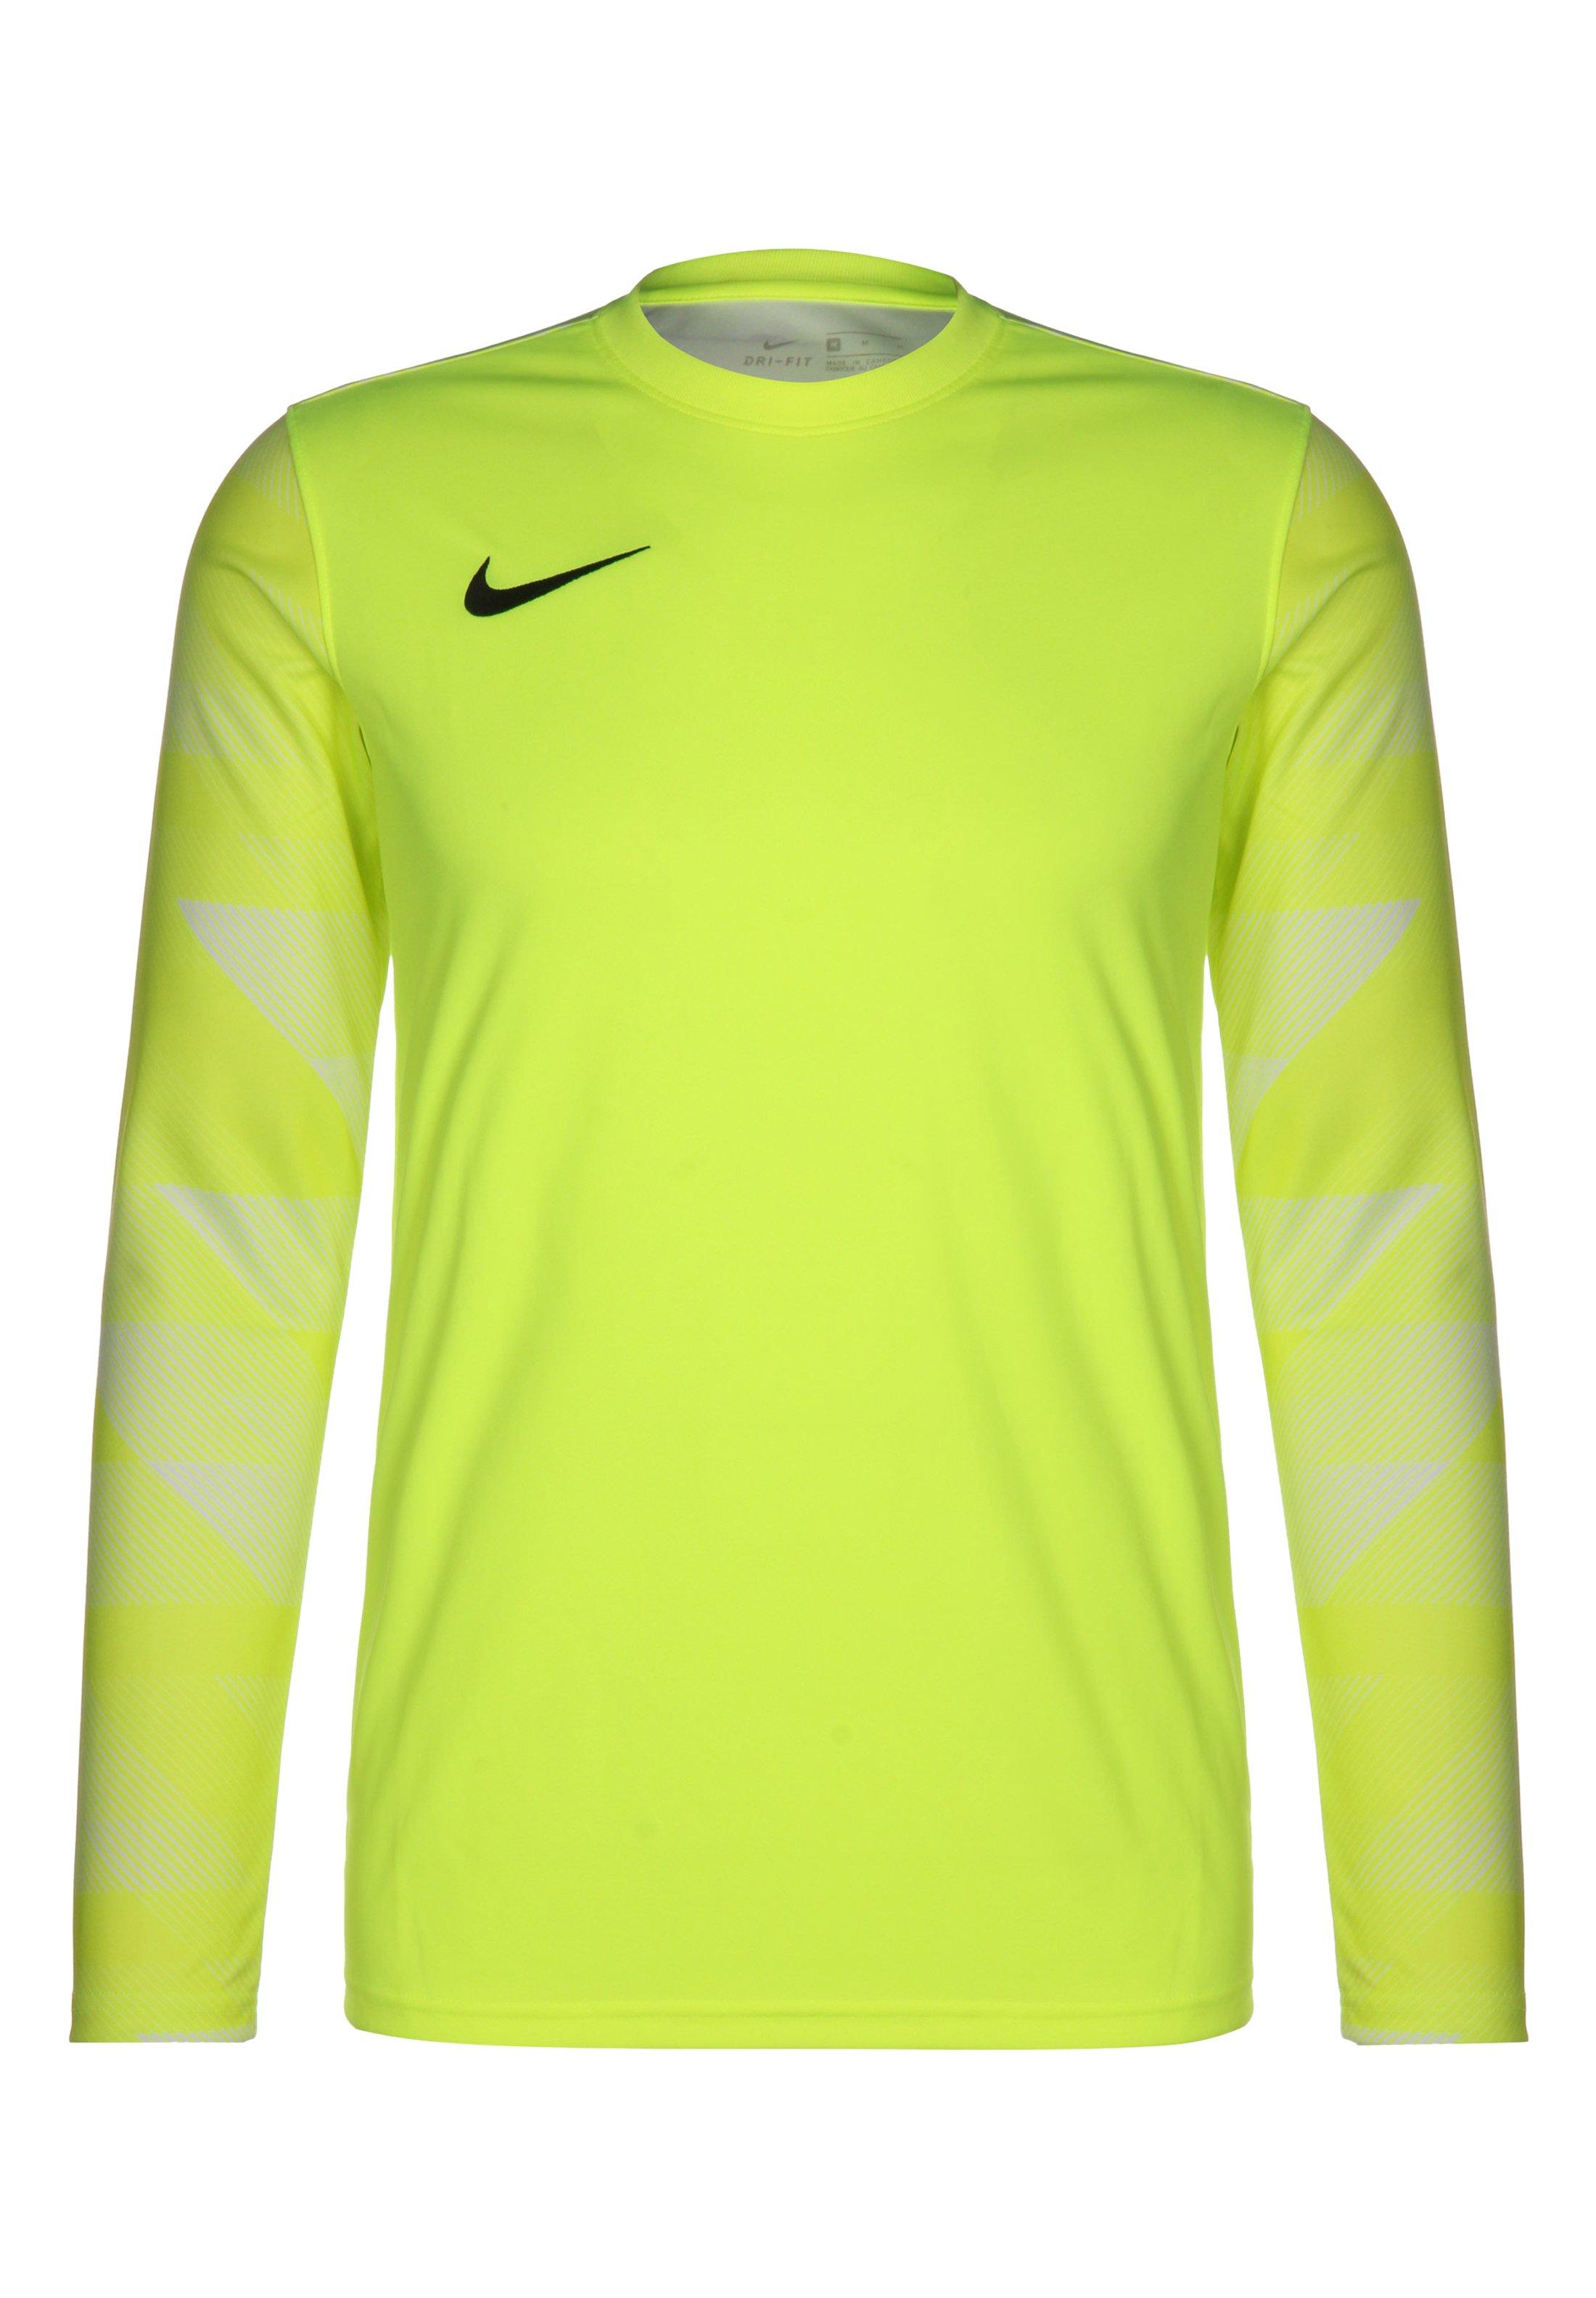 Uomo PARK IV TORWARTLONGSLEEVE HERREN - T-shirt sportiva